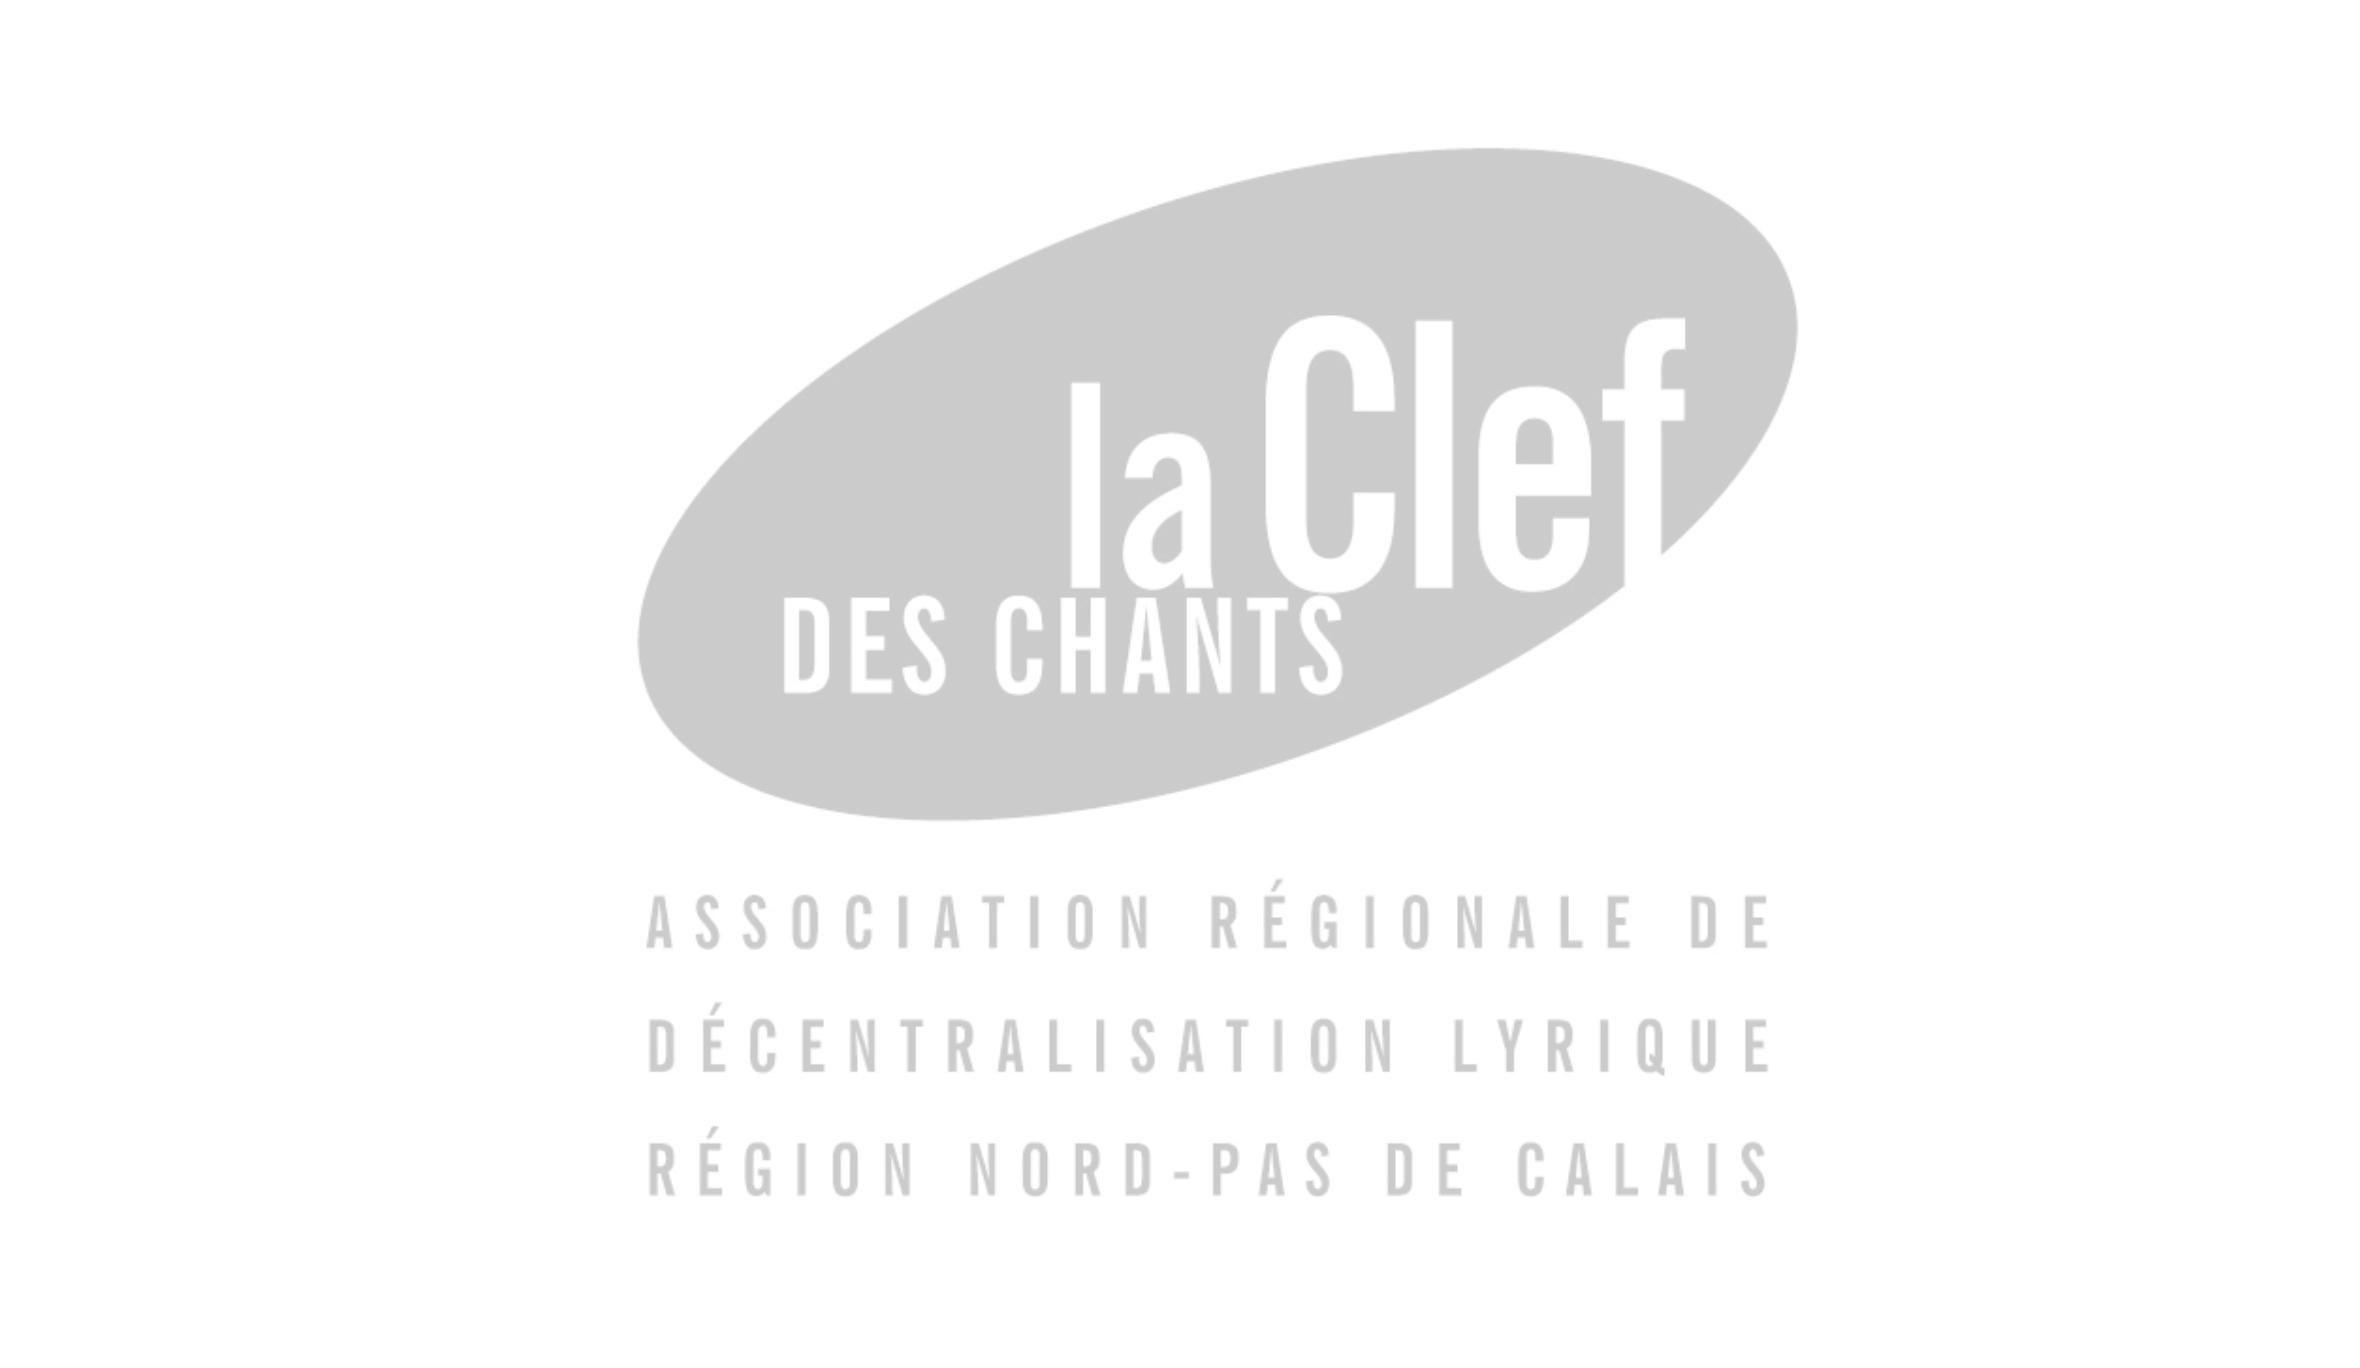 Logo_Clef_Des_Chants